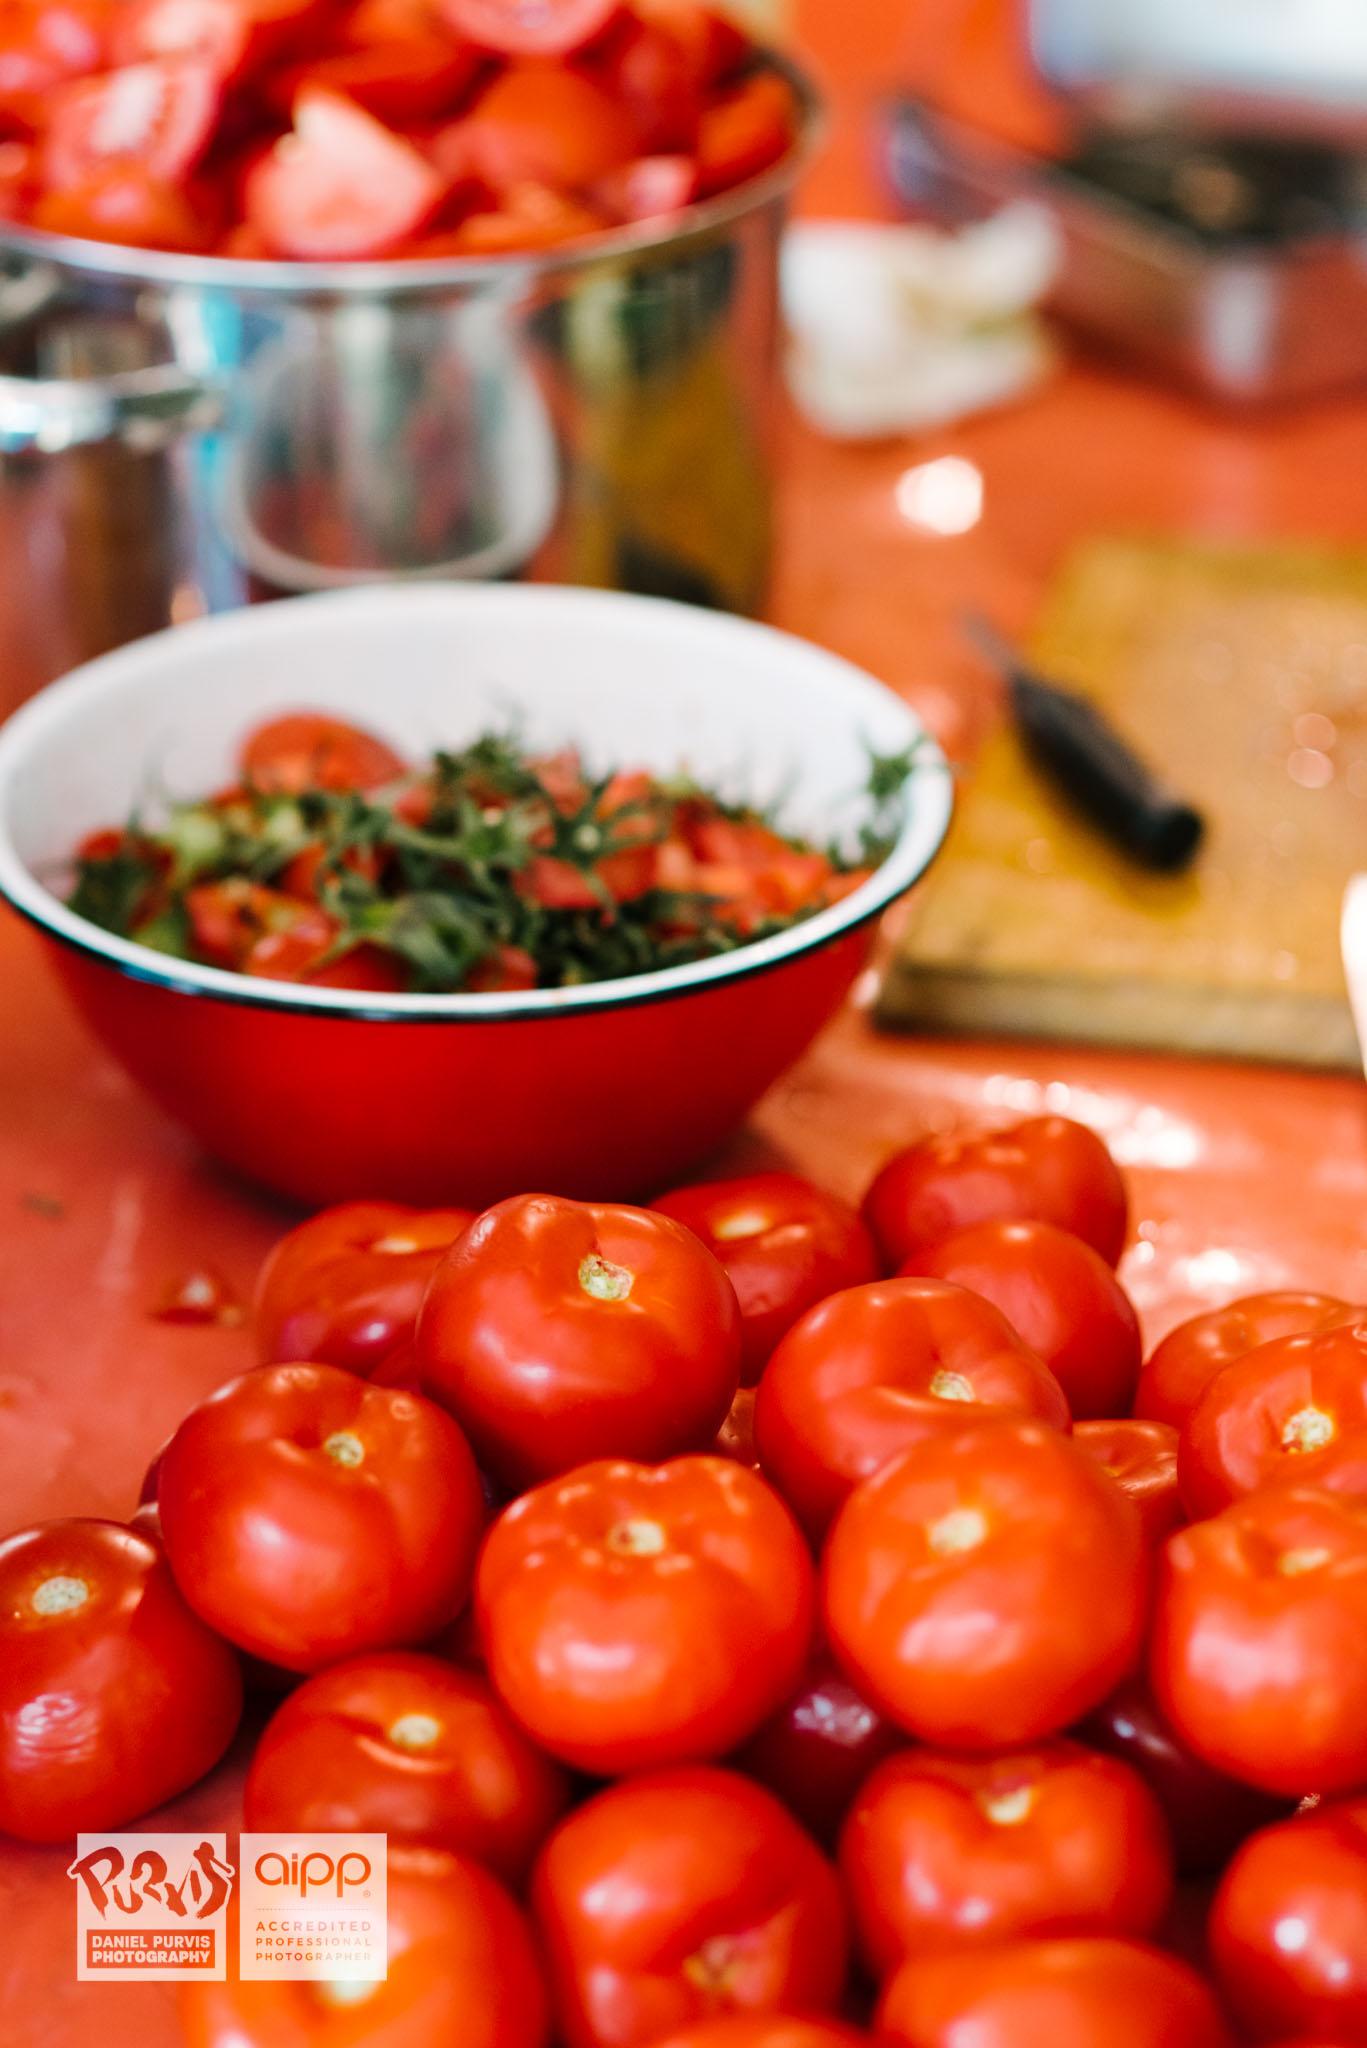 2019 Tomato Day - Daniel Purvis_DSC5001.jpg